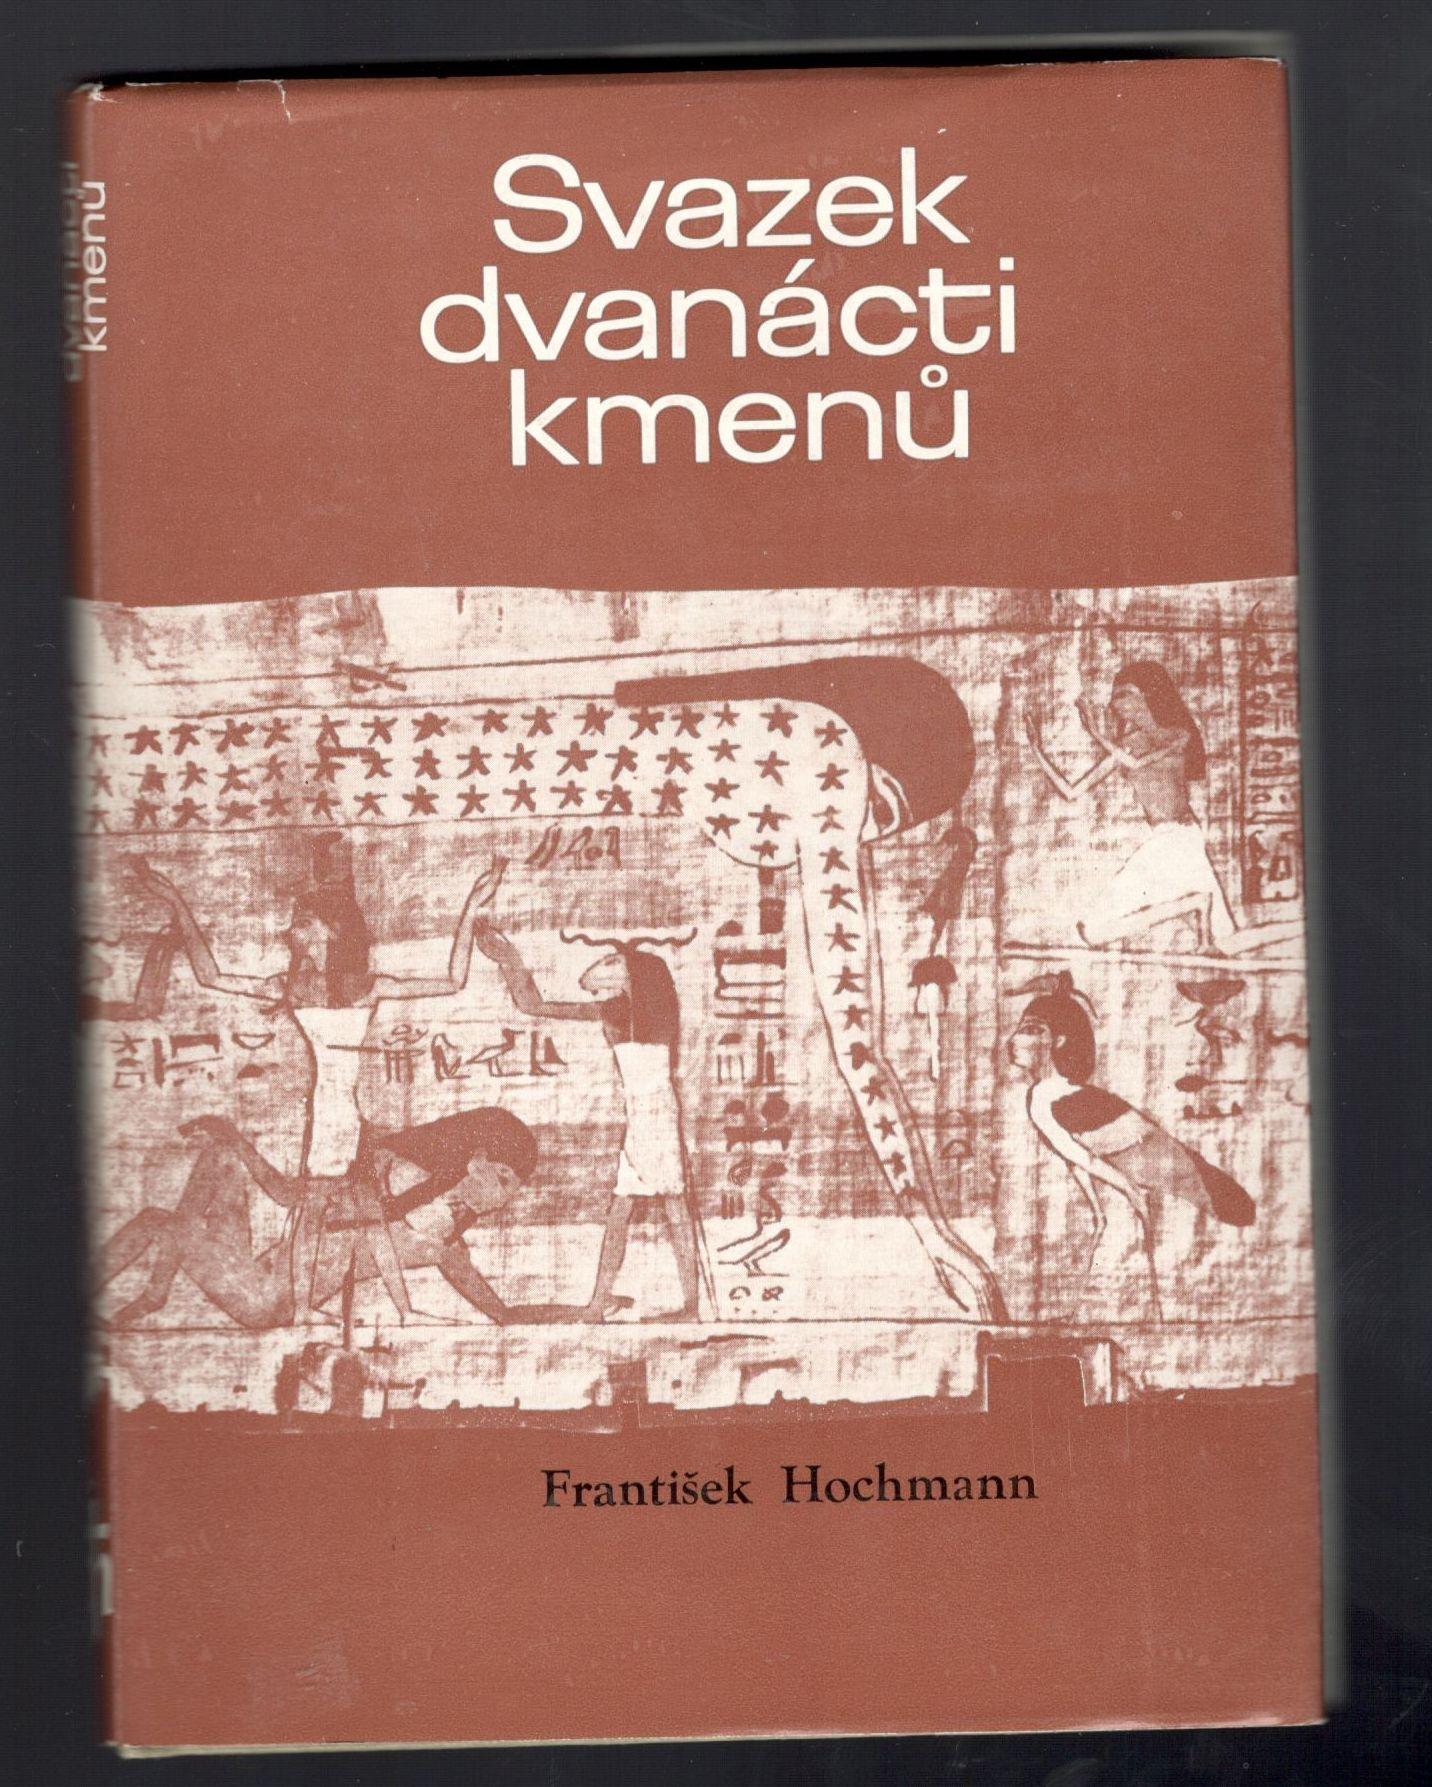 Svazek dvanácti kmenů - František Hochmann